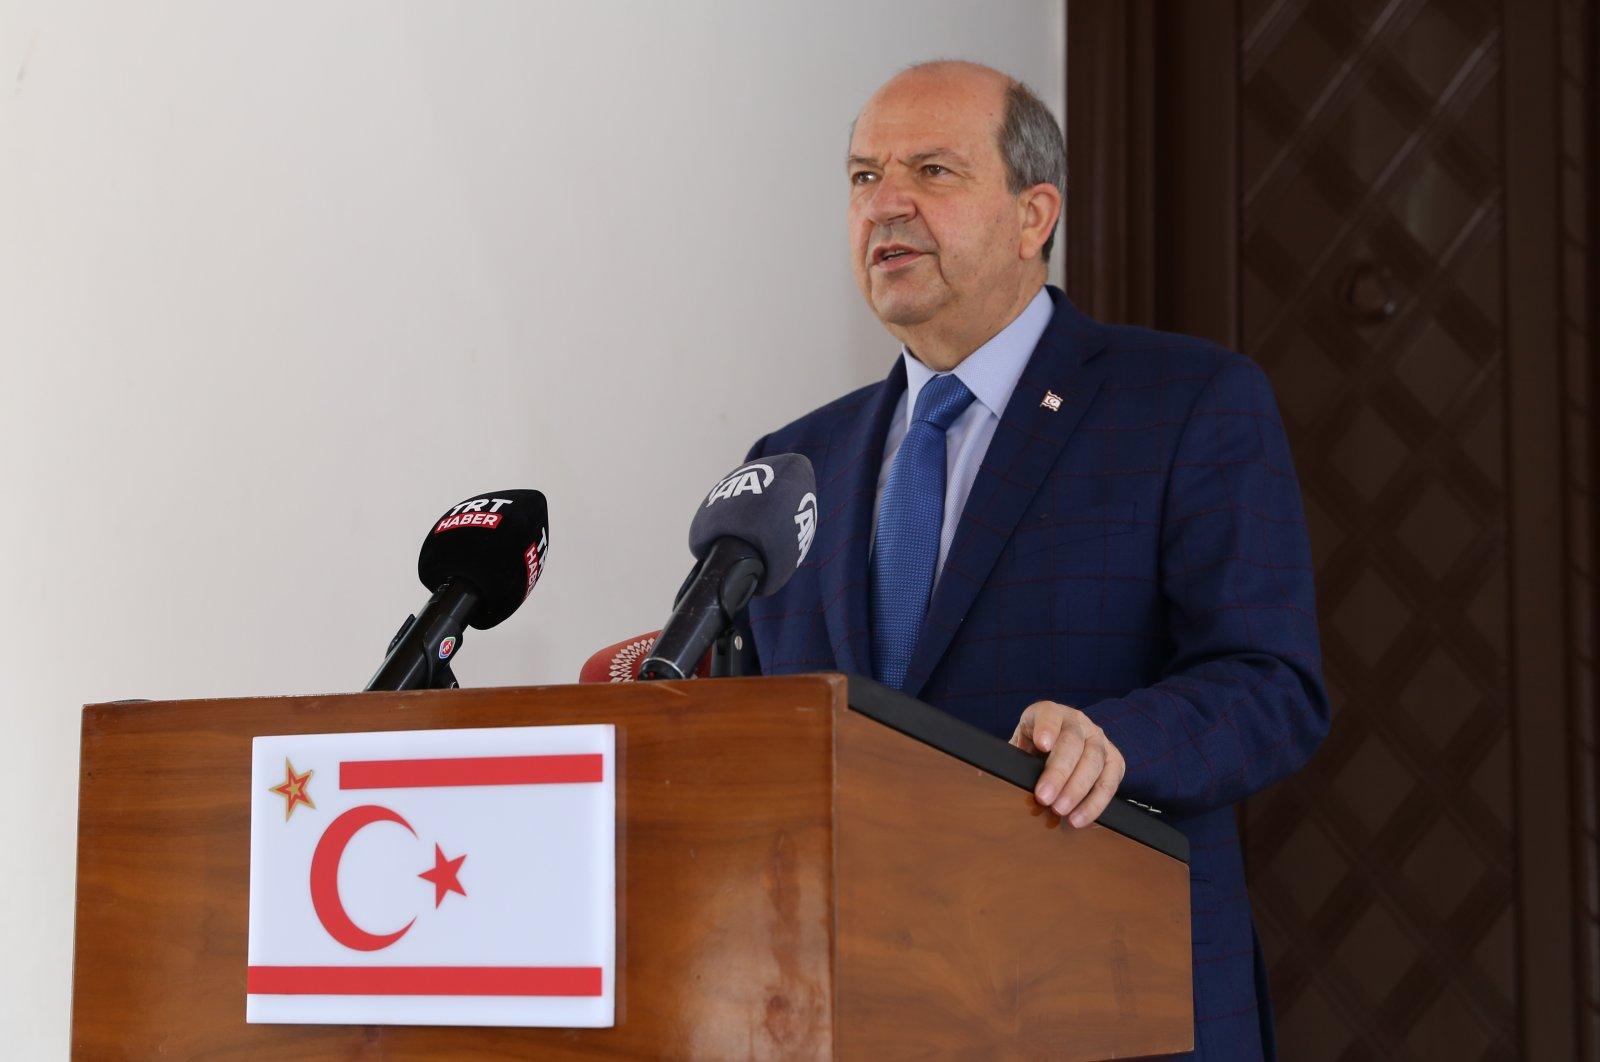 Turkish Republic of Northern Cyprus (TRNC) President Ersin Tatar speaks to reporters in Lefkoşa (Nicosia), TRNC, April 11, 2021. (AA Photo)